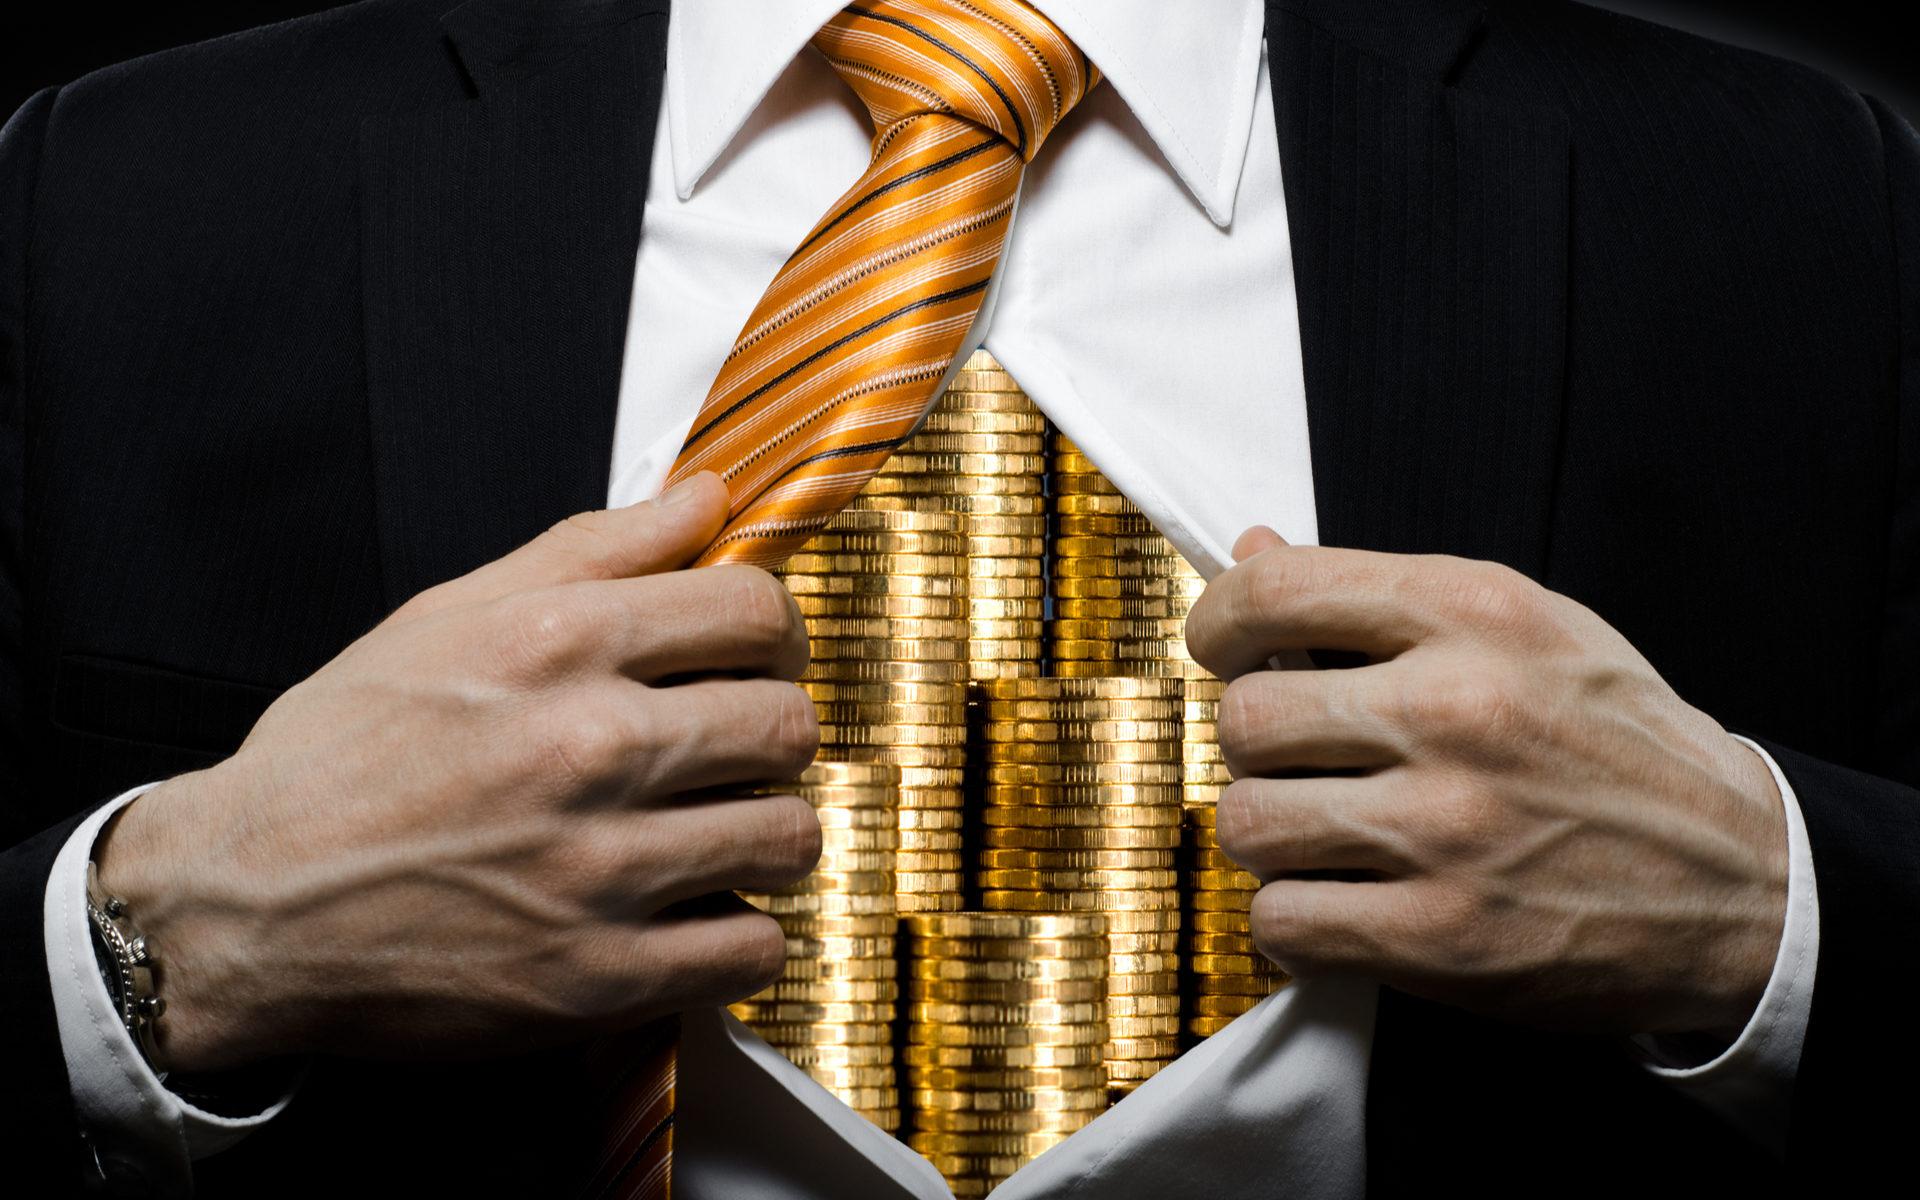 bitmex owns 30,300 bitcoin